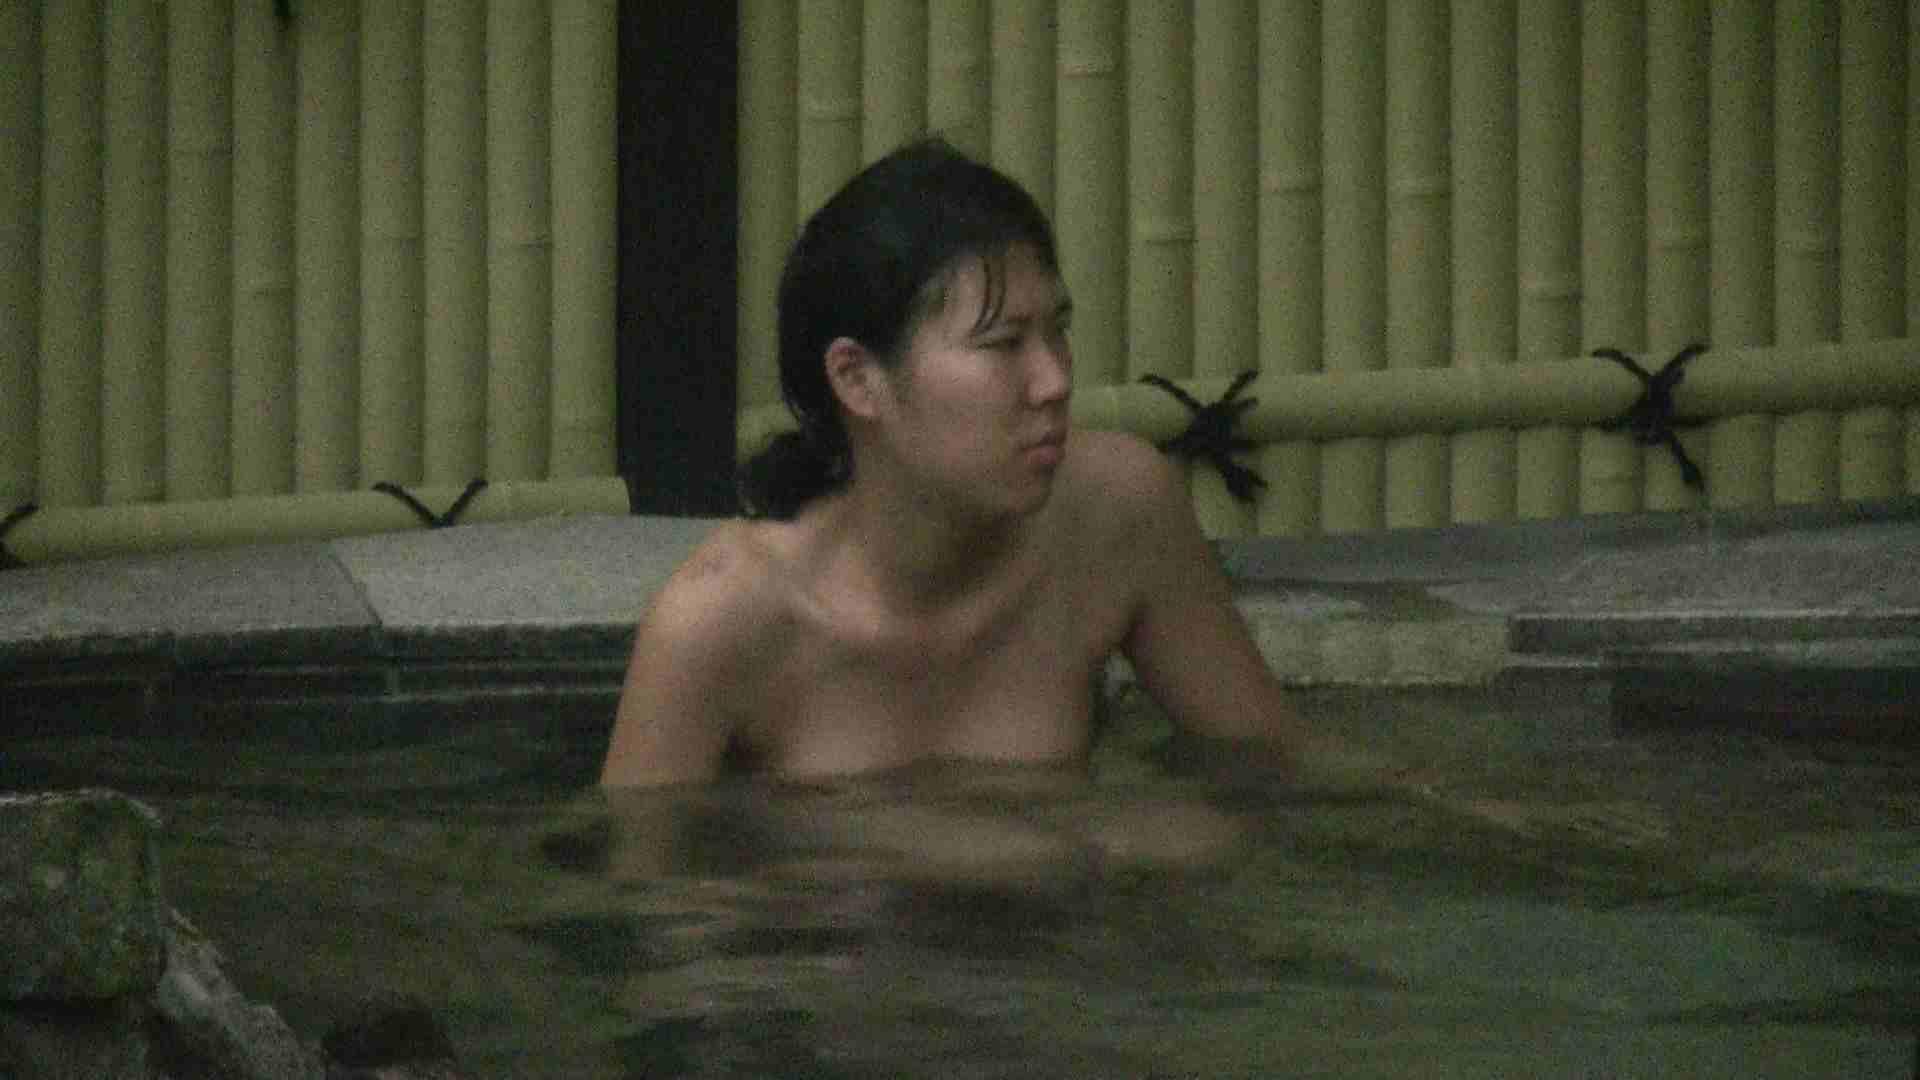 Aquaな露天風呂Vol.215 露天  74連発 45